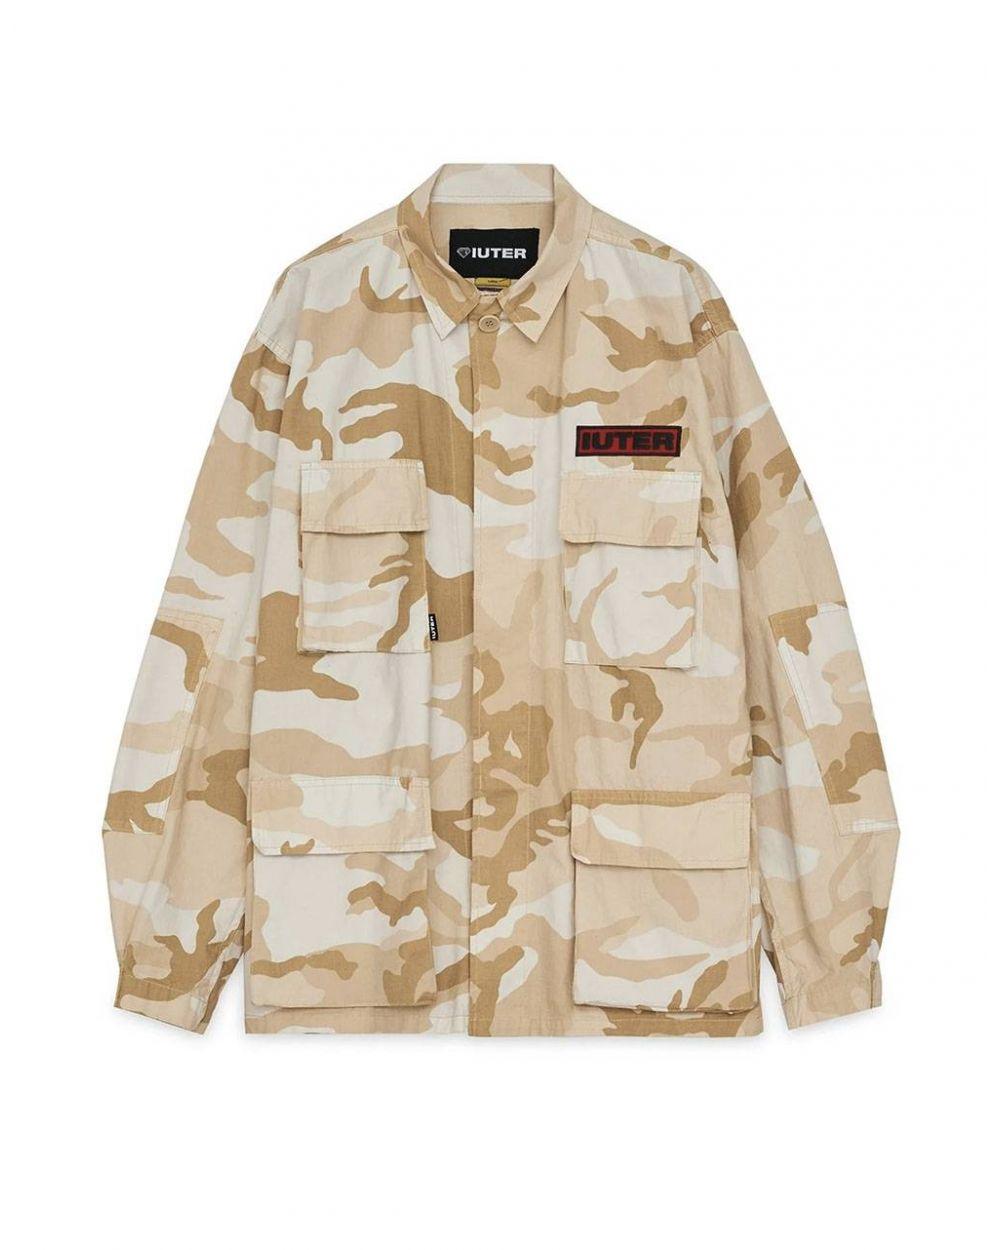 Iuter Struggle overshirt jacket - Beige IUTER Light jacket 199,00€